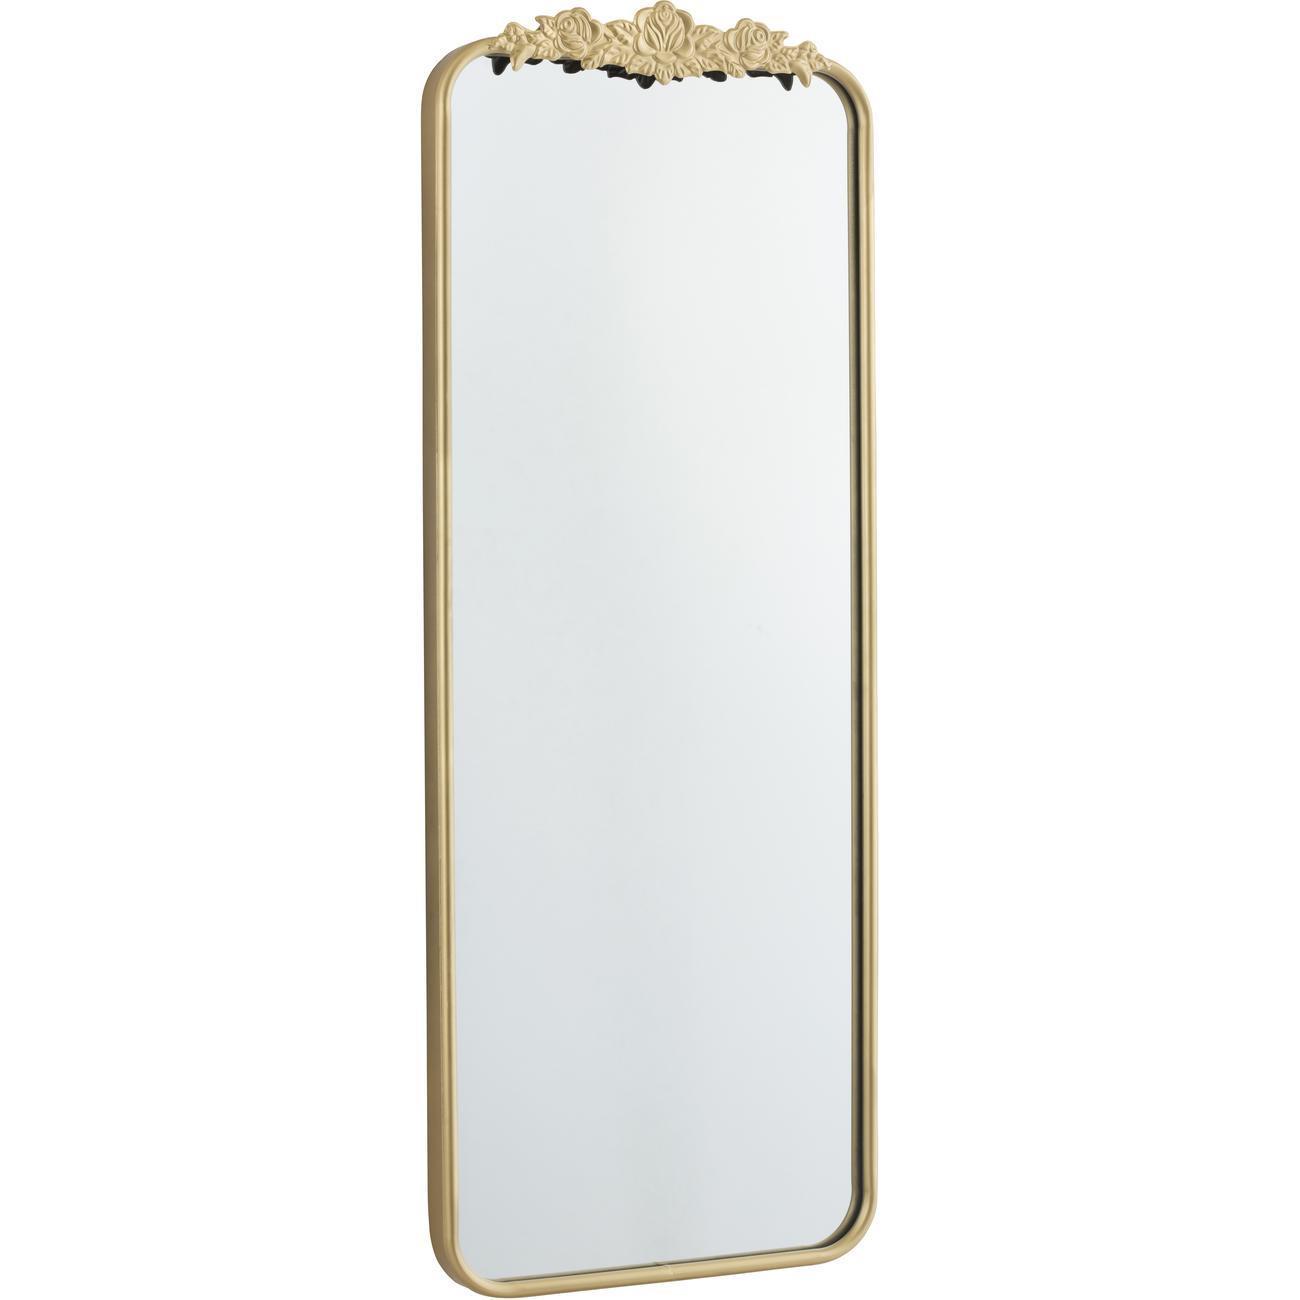 Miroir rectangulaire Galway4